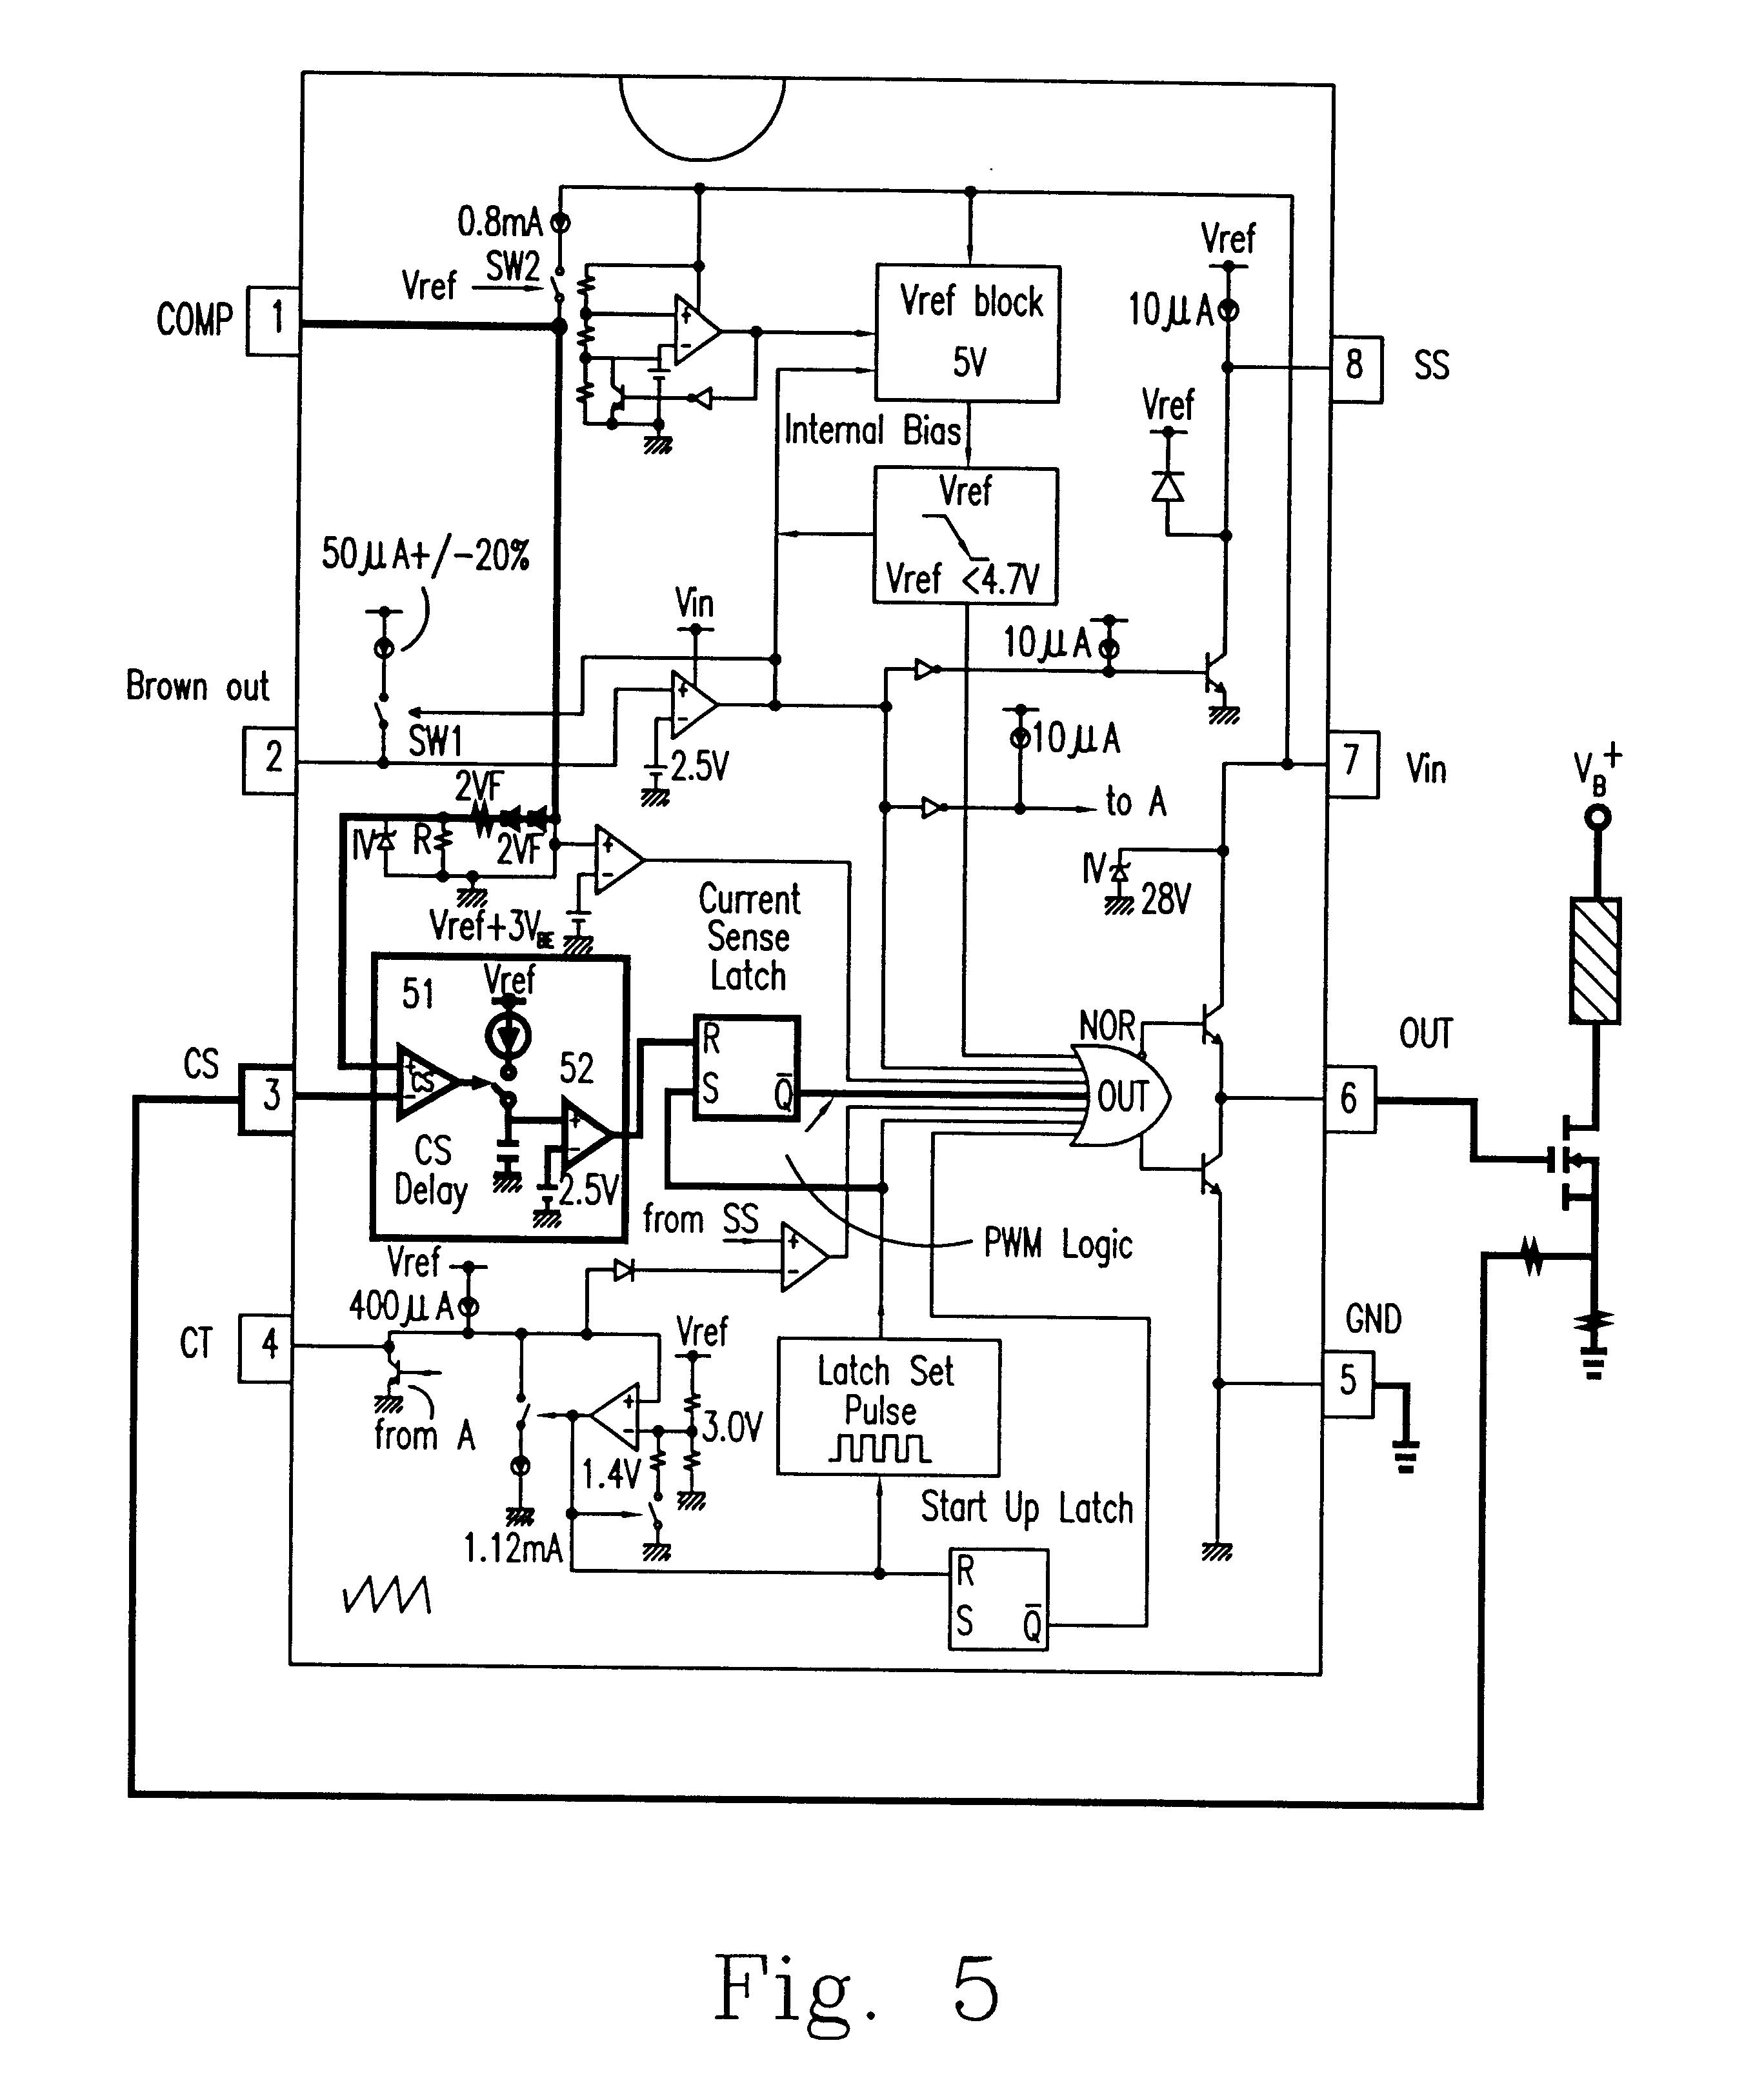 Scion Wiring Diagrams Http Wwwthe12voltcom Installbay Forumposts